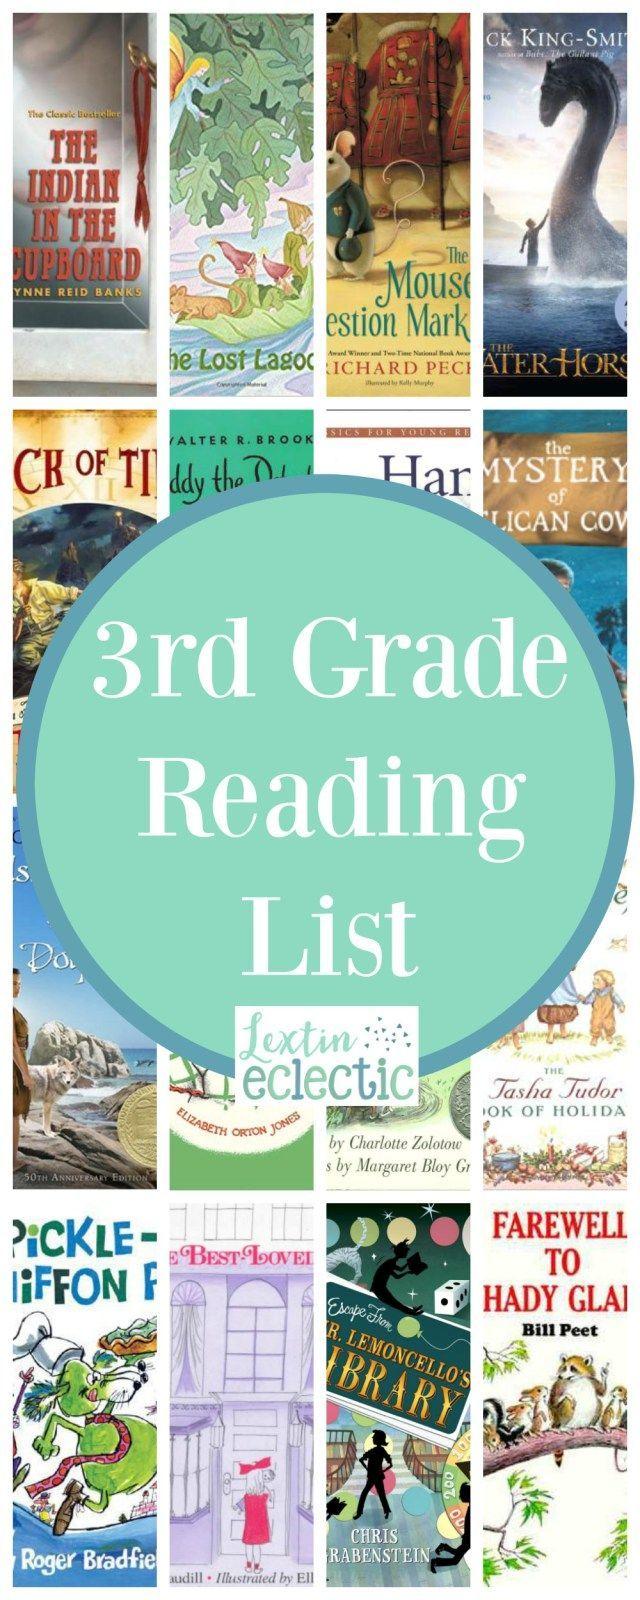 3rd Grade Reading List - Lextin Eclectic